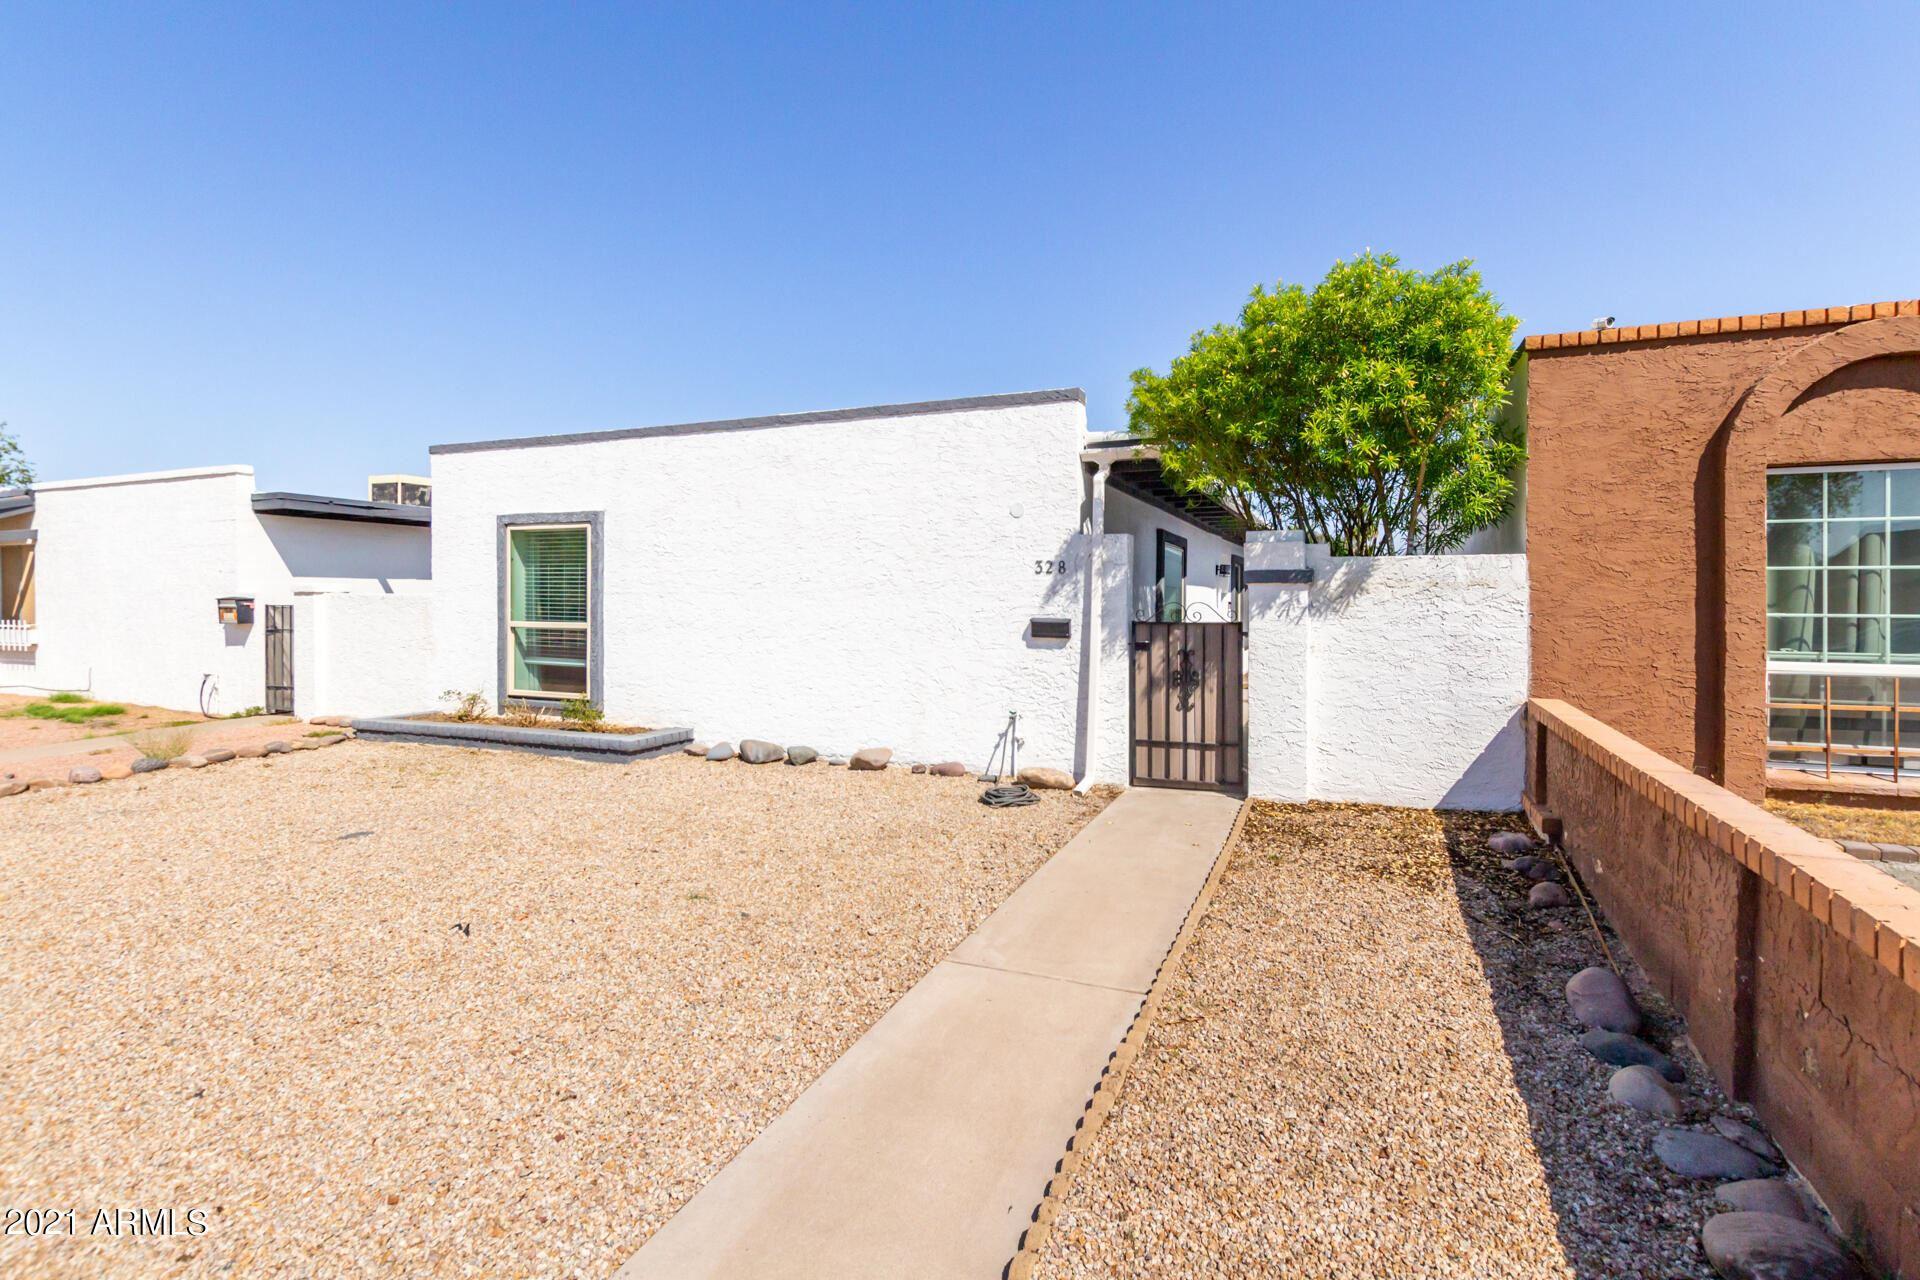 Photo of 328 W MANHATTON Drive, Tempe, AZ 85282 (MLS # 6293198)